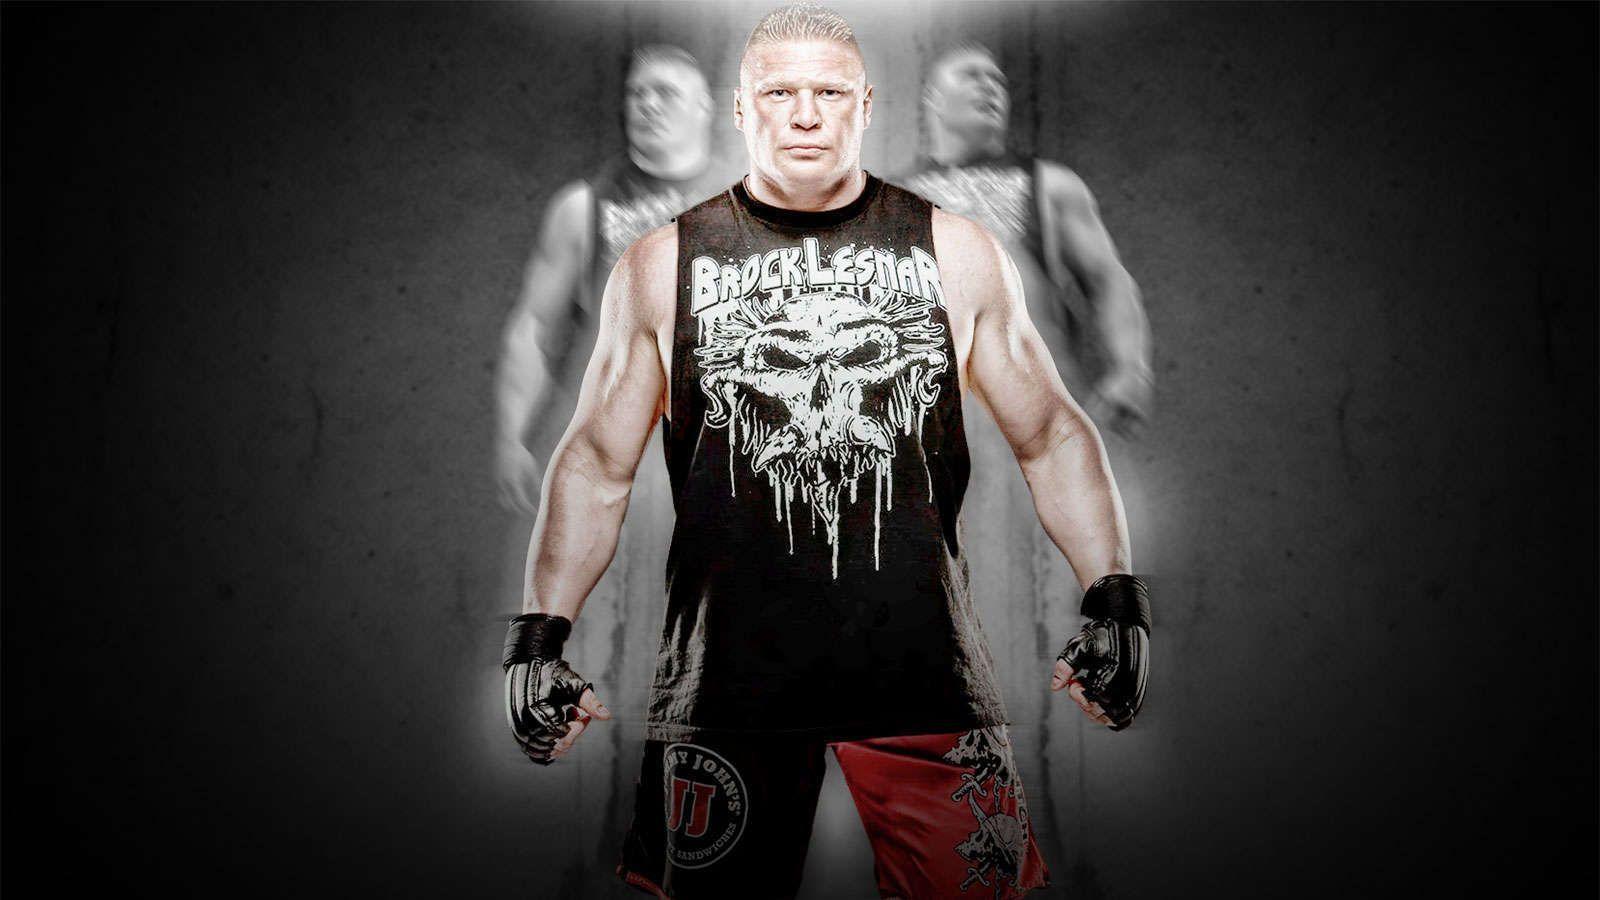 Brock Lesnar HD Images 9